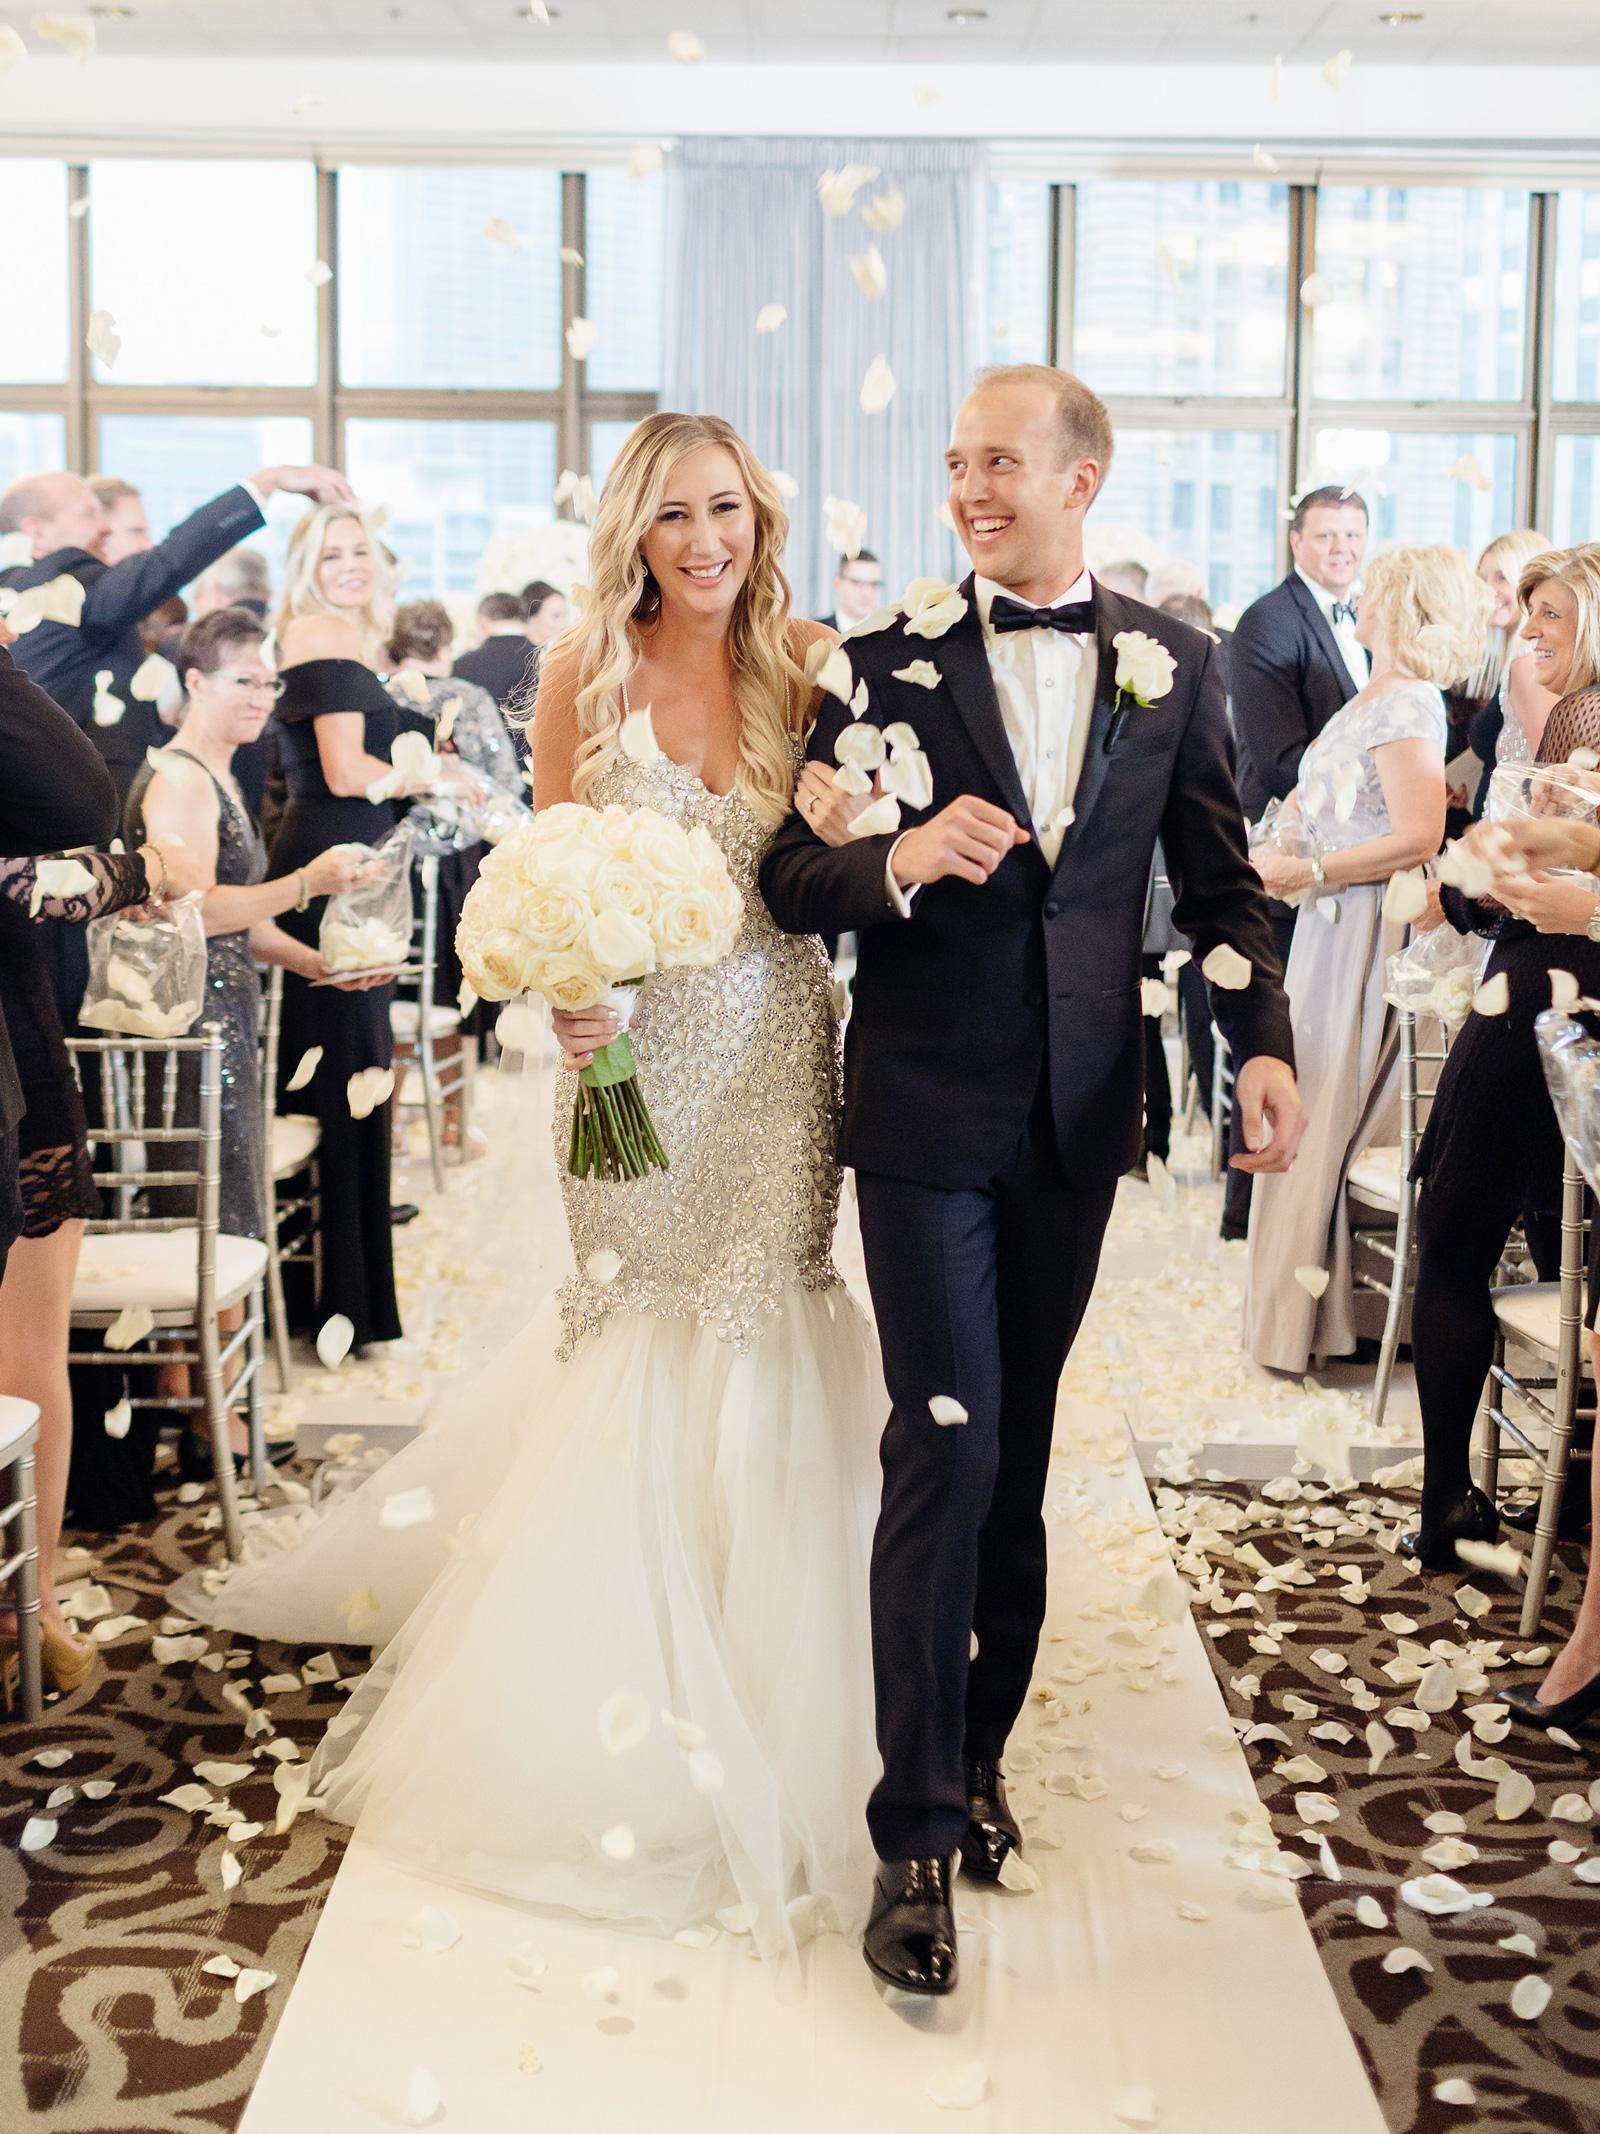 "057e0058b1c7 Carly Cristman Wedding Album. Chicago, Illinois. (Credit: Sarah Postma). THE  FOOD. """